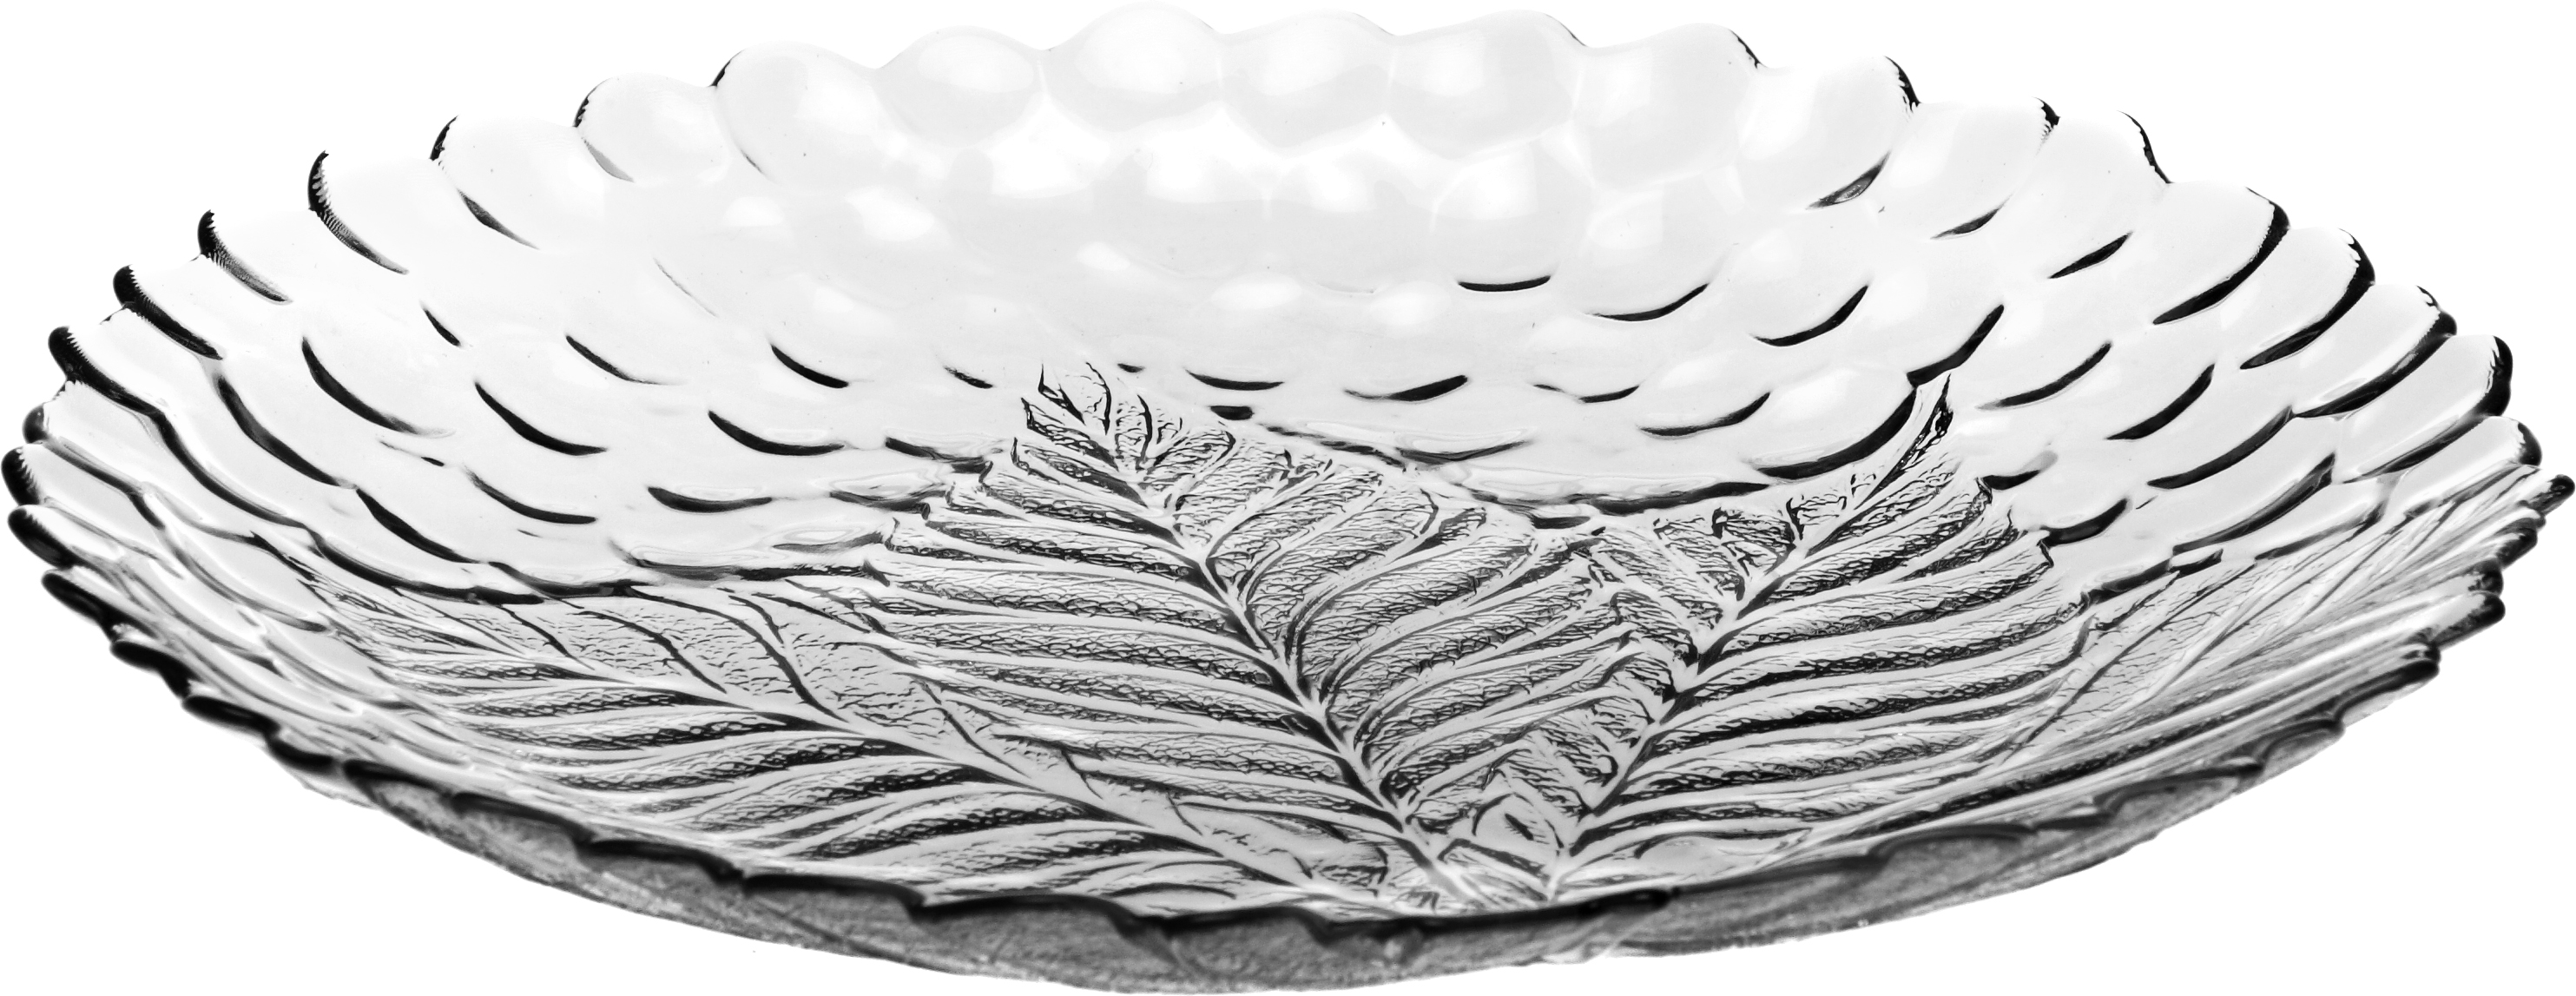 Тарелка Pasabahce Султана, цвет: прозрачный, диаметр 24 см ваза pasabahce ботаника цвет прозрачный 20 см 80139slb